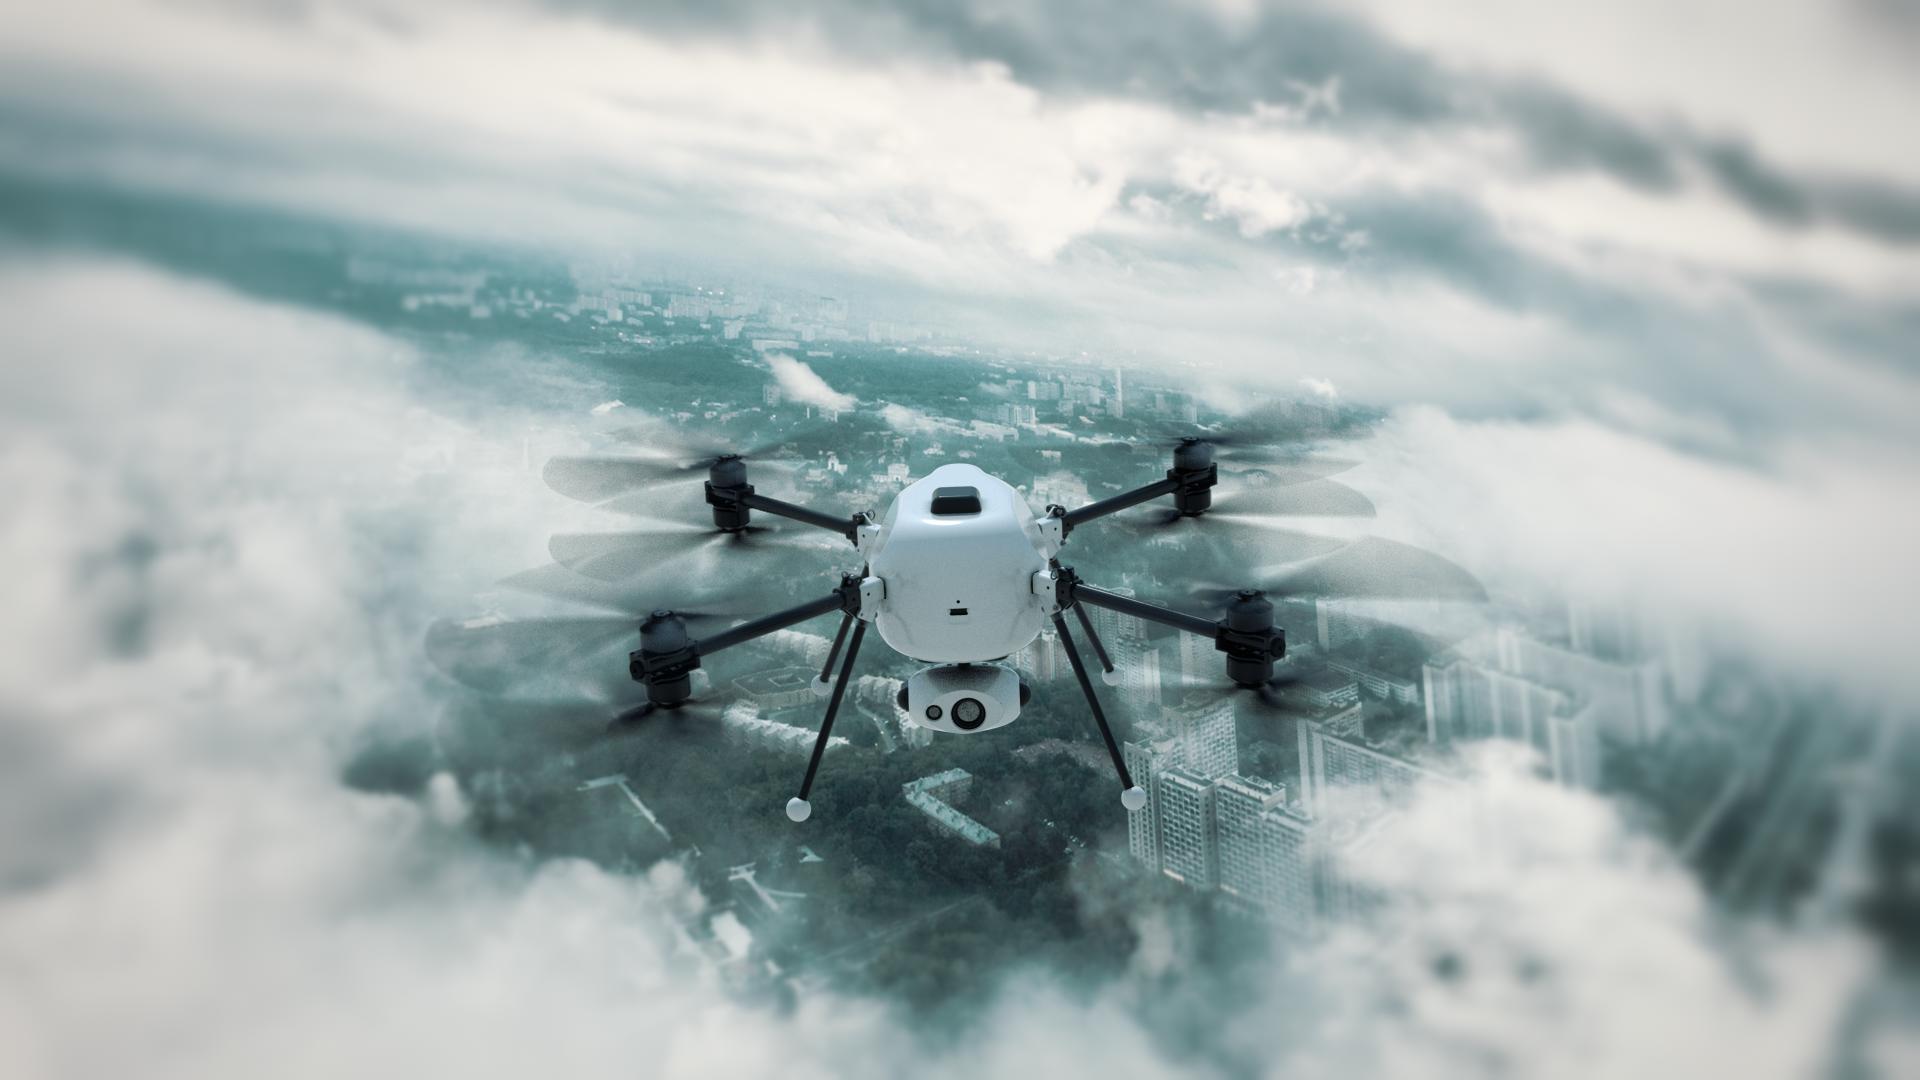 Квадрокоптер Вяхирь (кадр из 3д-анимации)